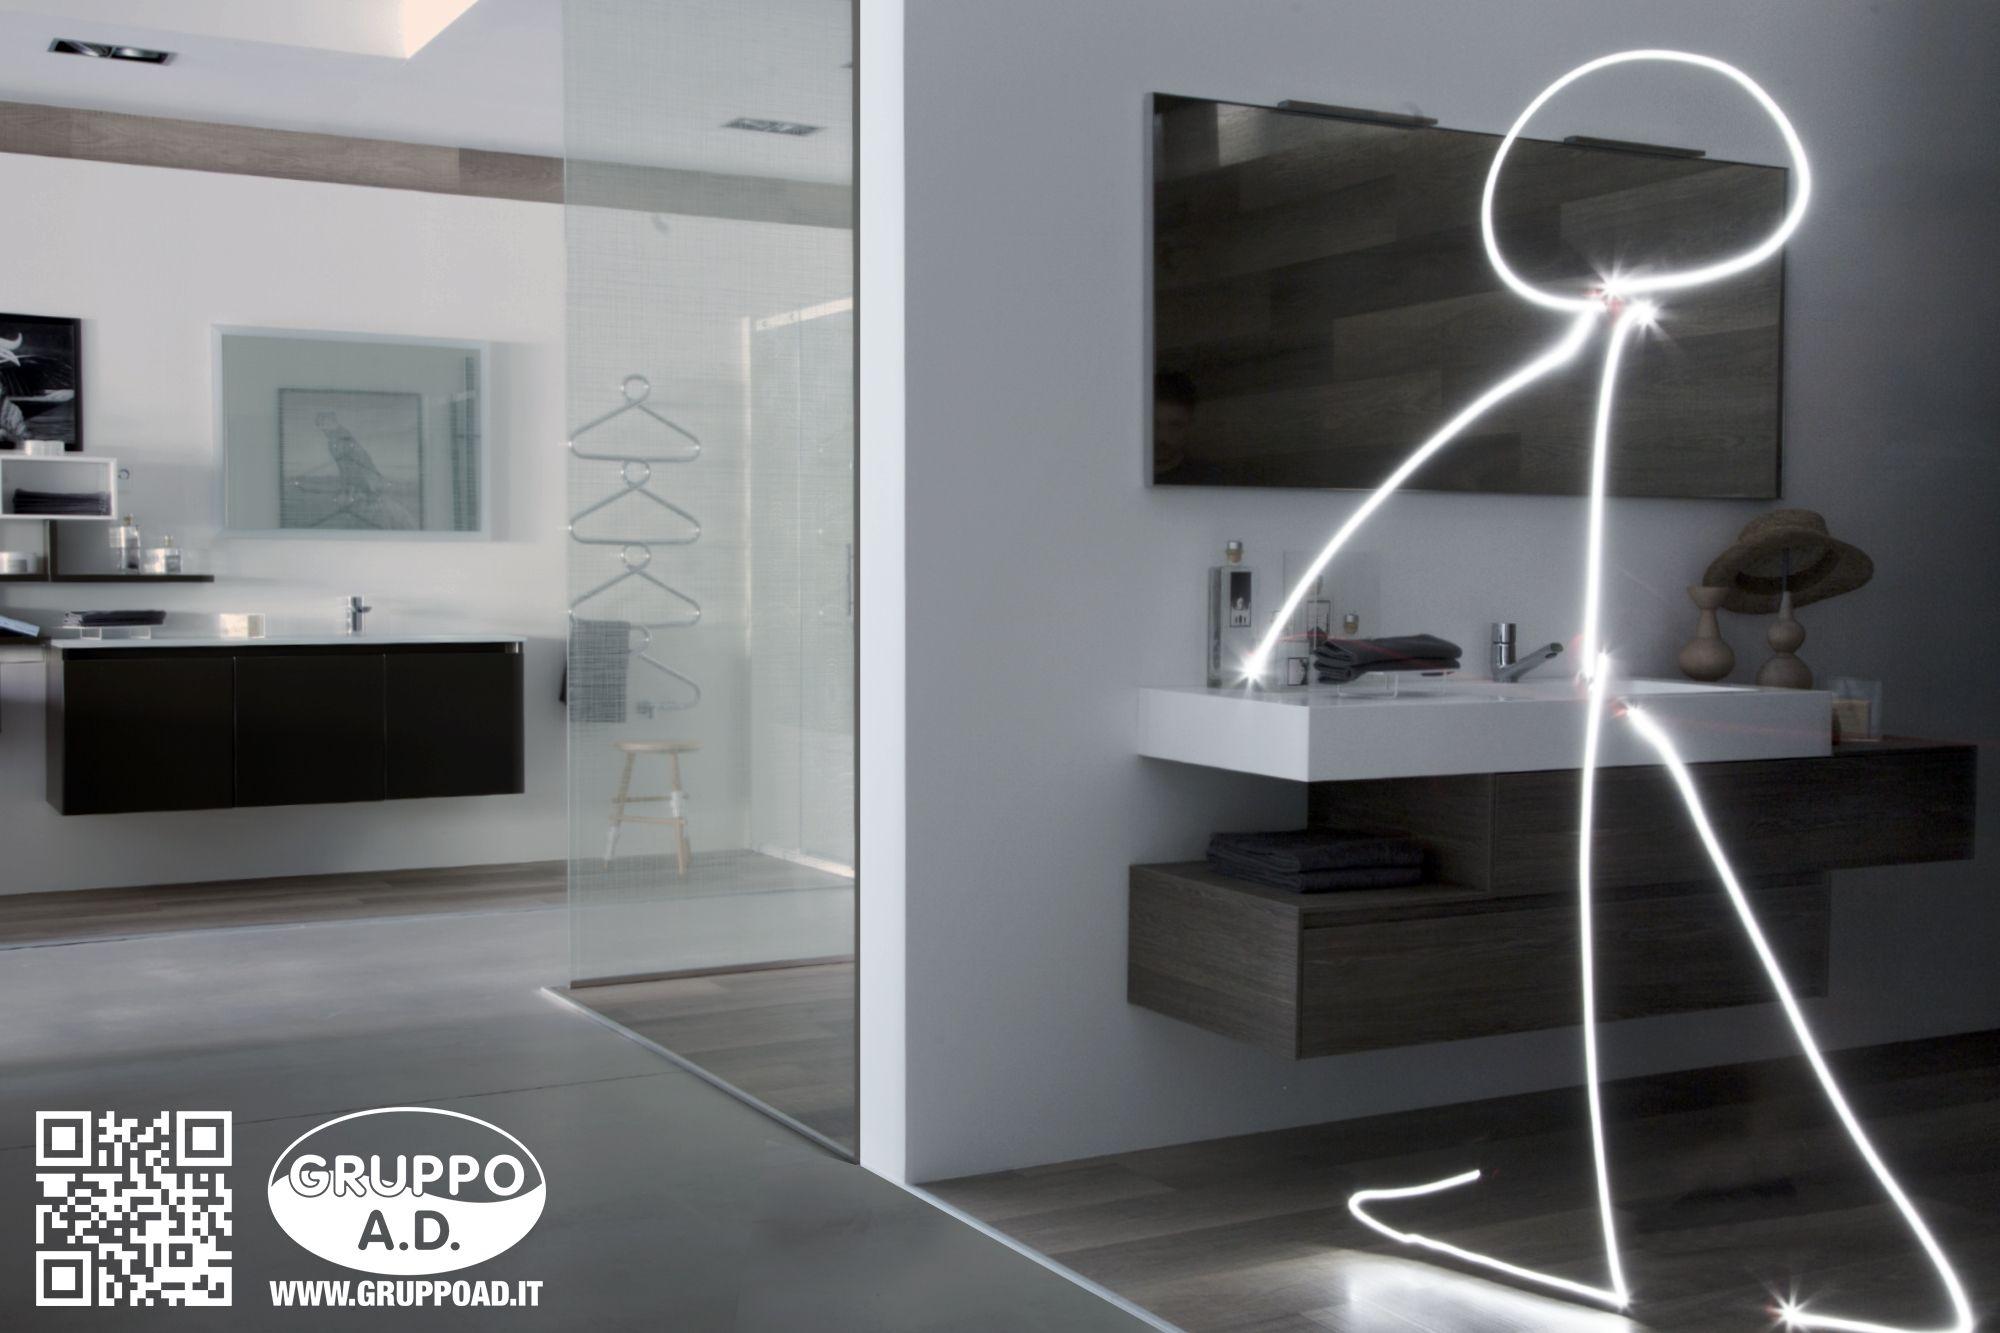 mobilibagno #arredobagno #showroom #bathroomfurniture #design ... - Arredo Bagno Foligno